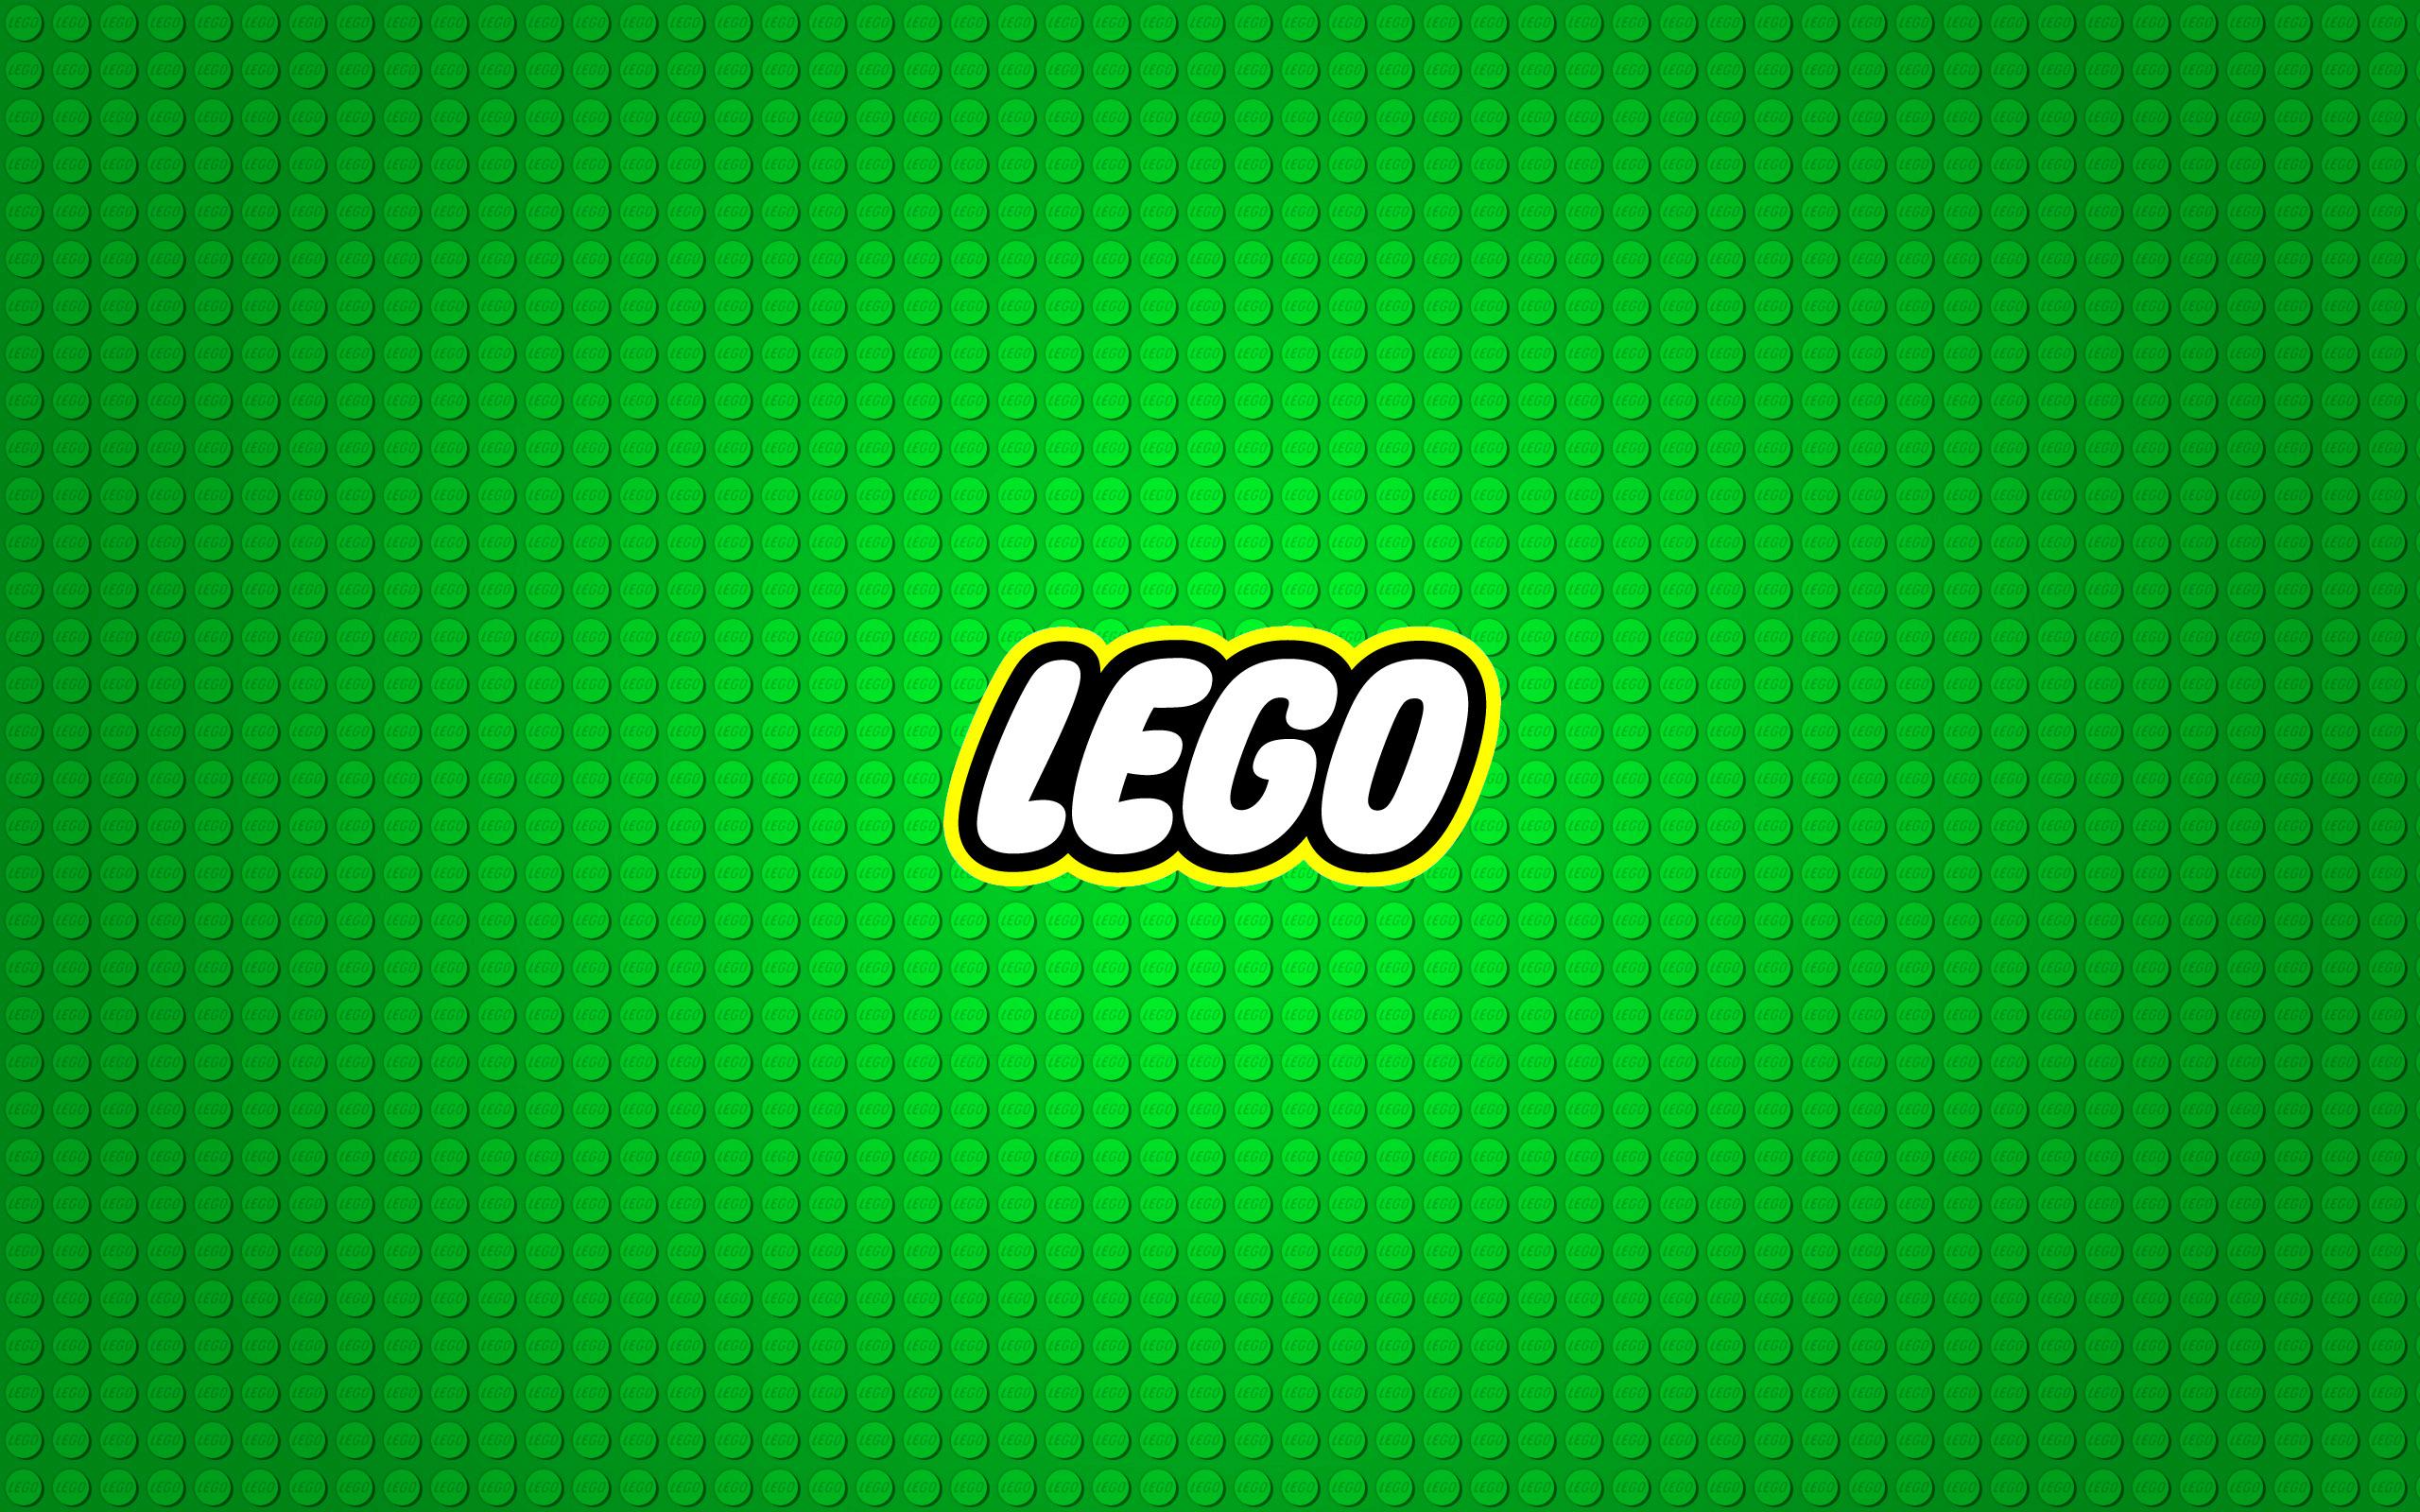 Green Lego Wallpaper 47312 2560x1600 px HDWallSourcecom